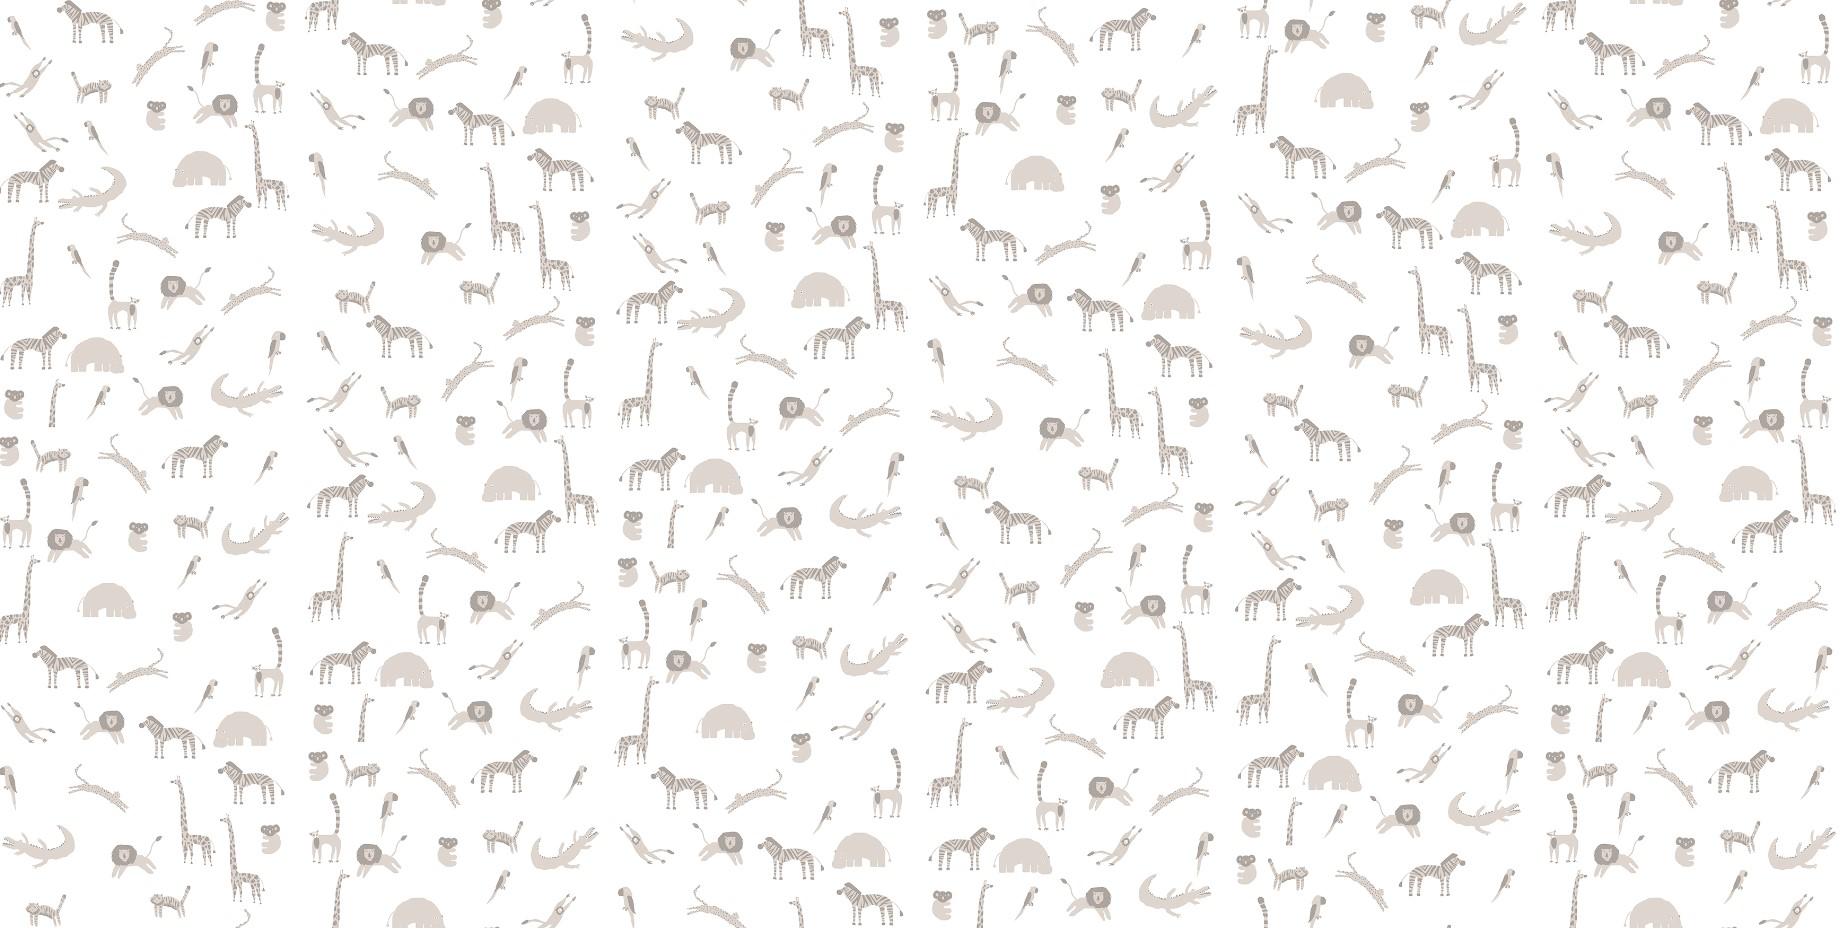 Фоны и текстуры - 22 | Wall-Style